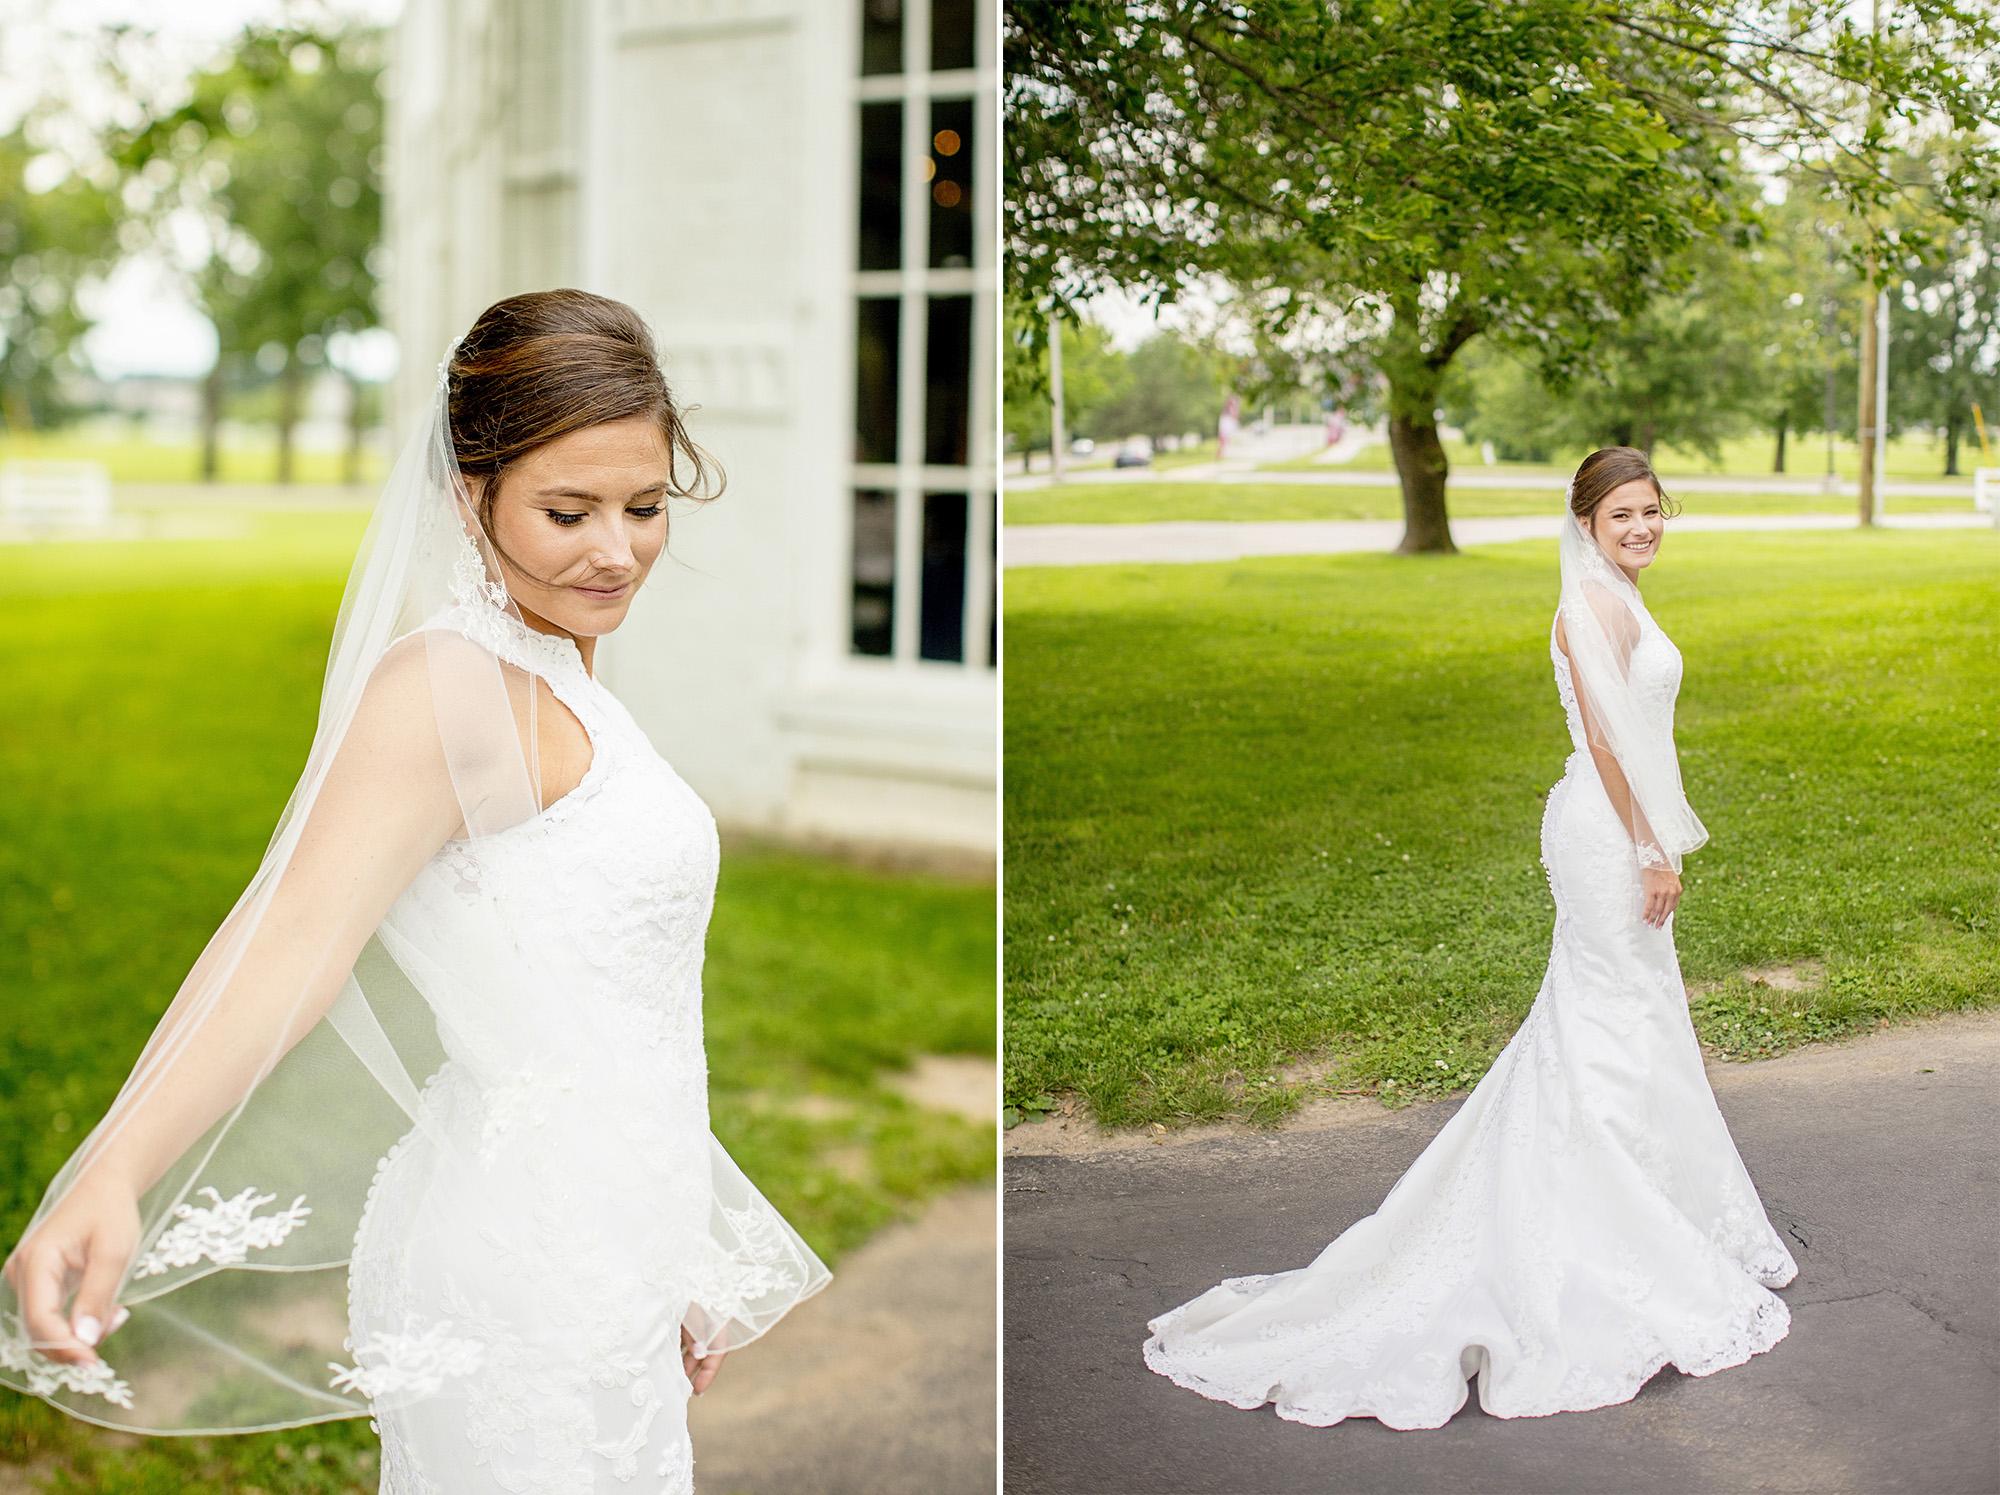 Seriously_Sabrina_Photography_Lexington_Kentucky_Round_Barn_Red_Mile_Stable_of_Memories_Wedding_Hart_45.jpg